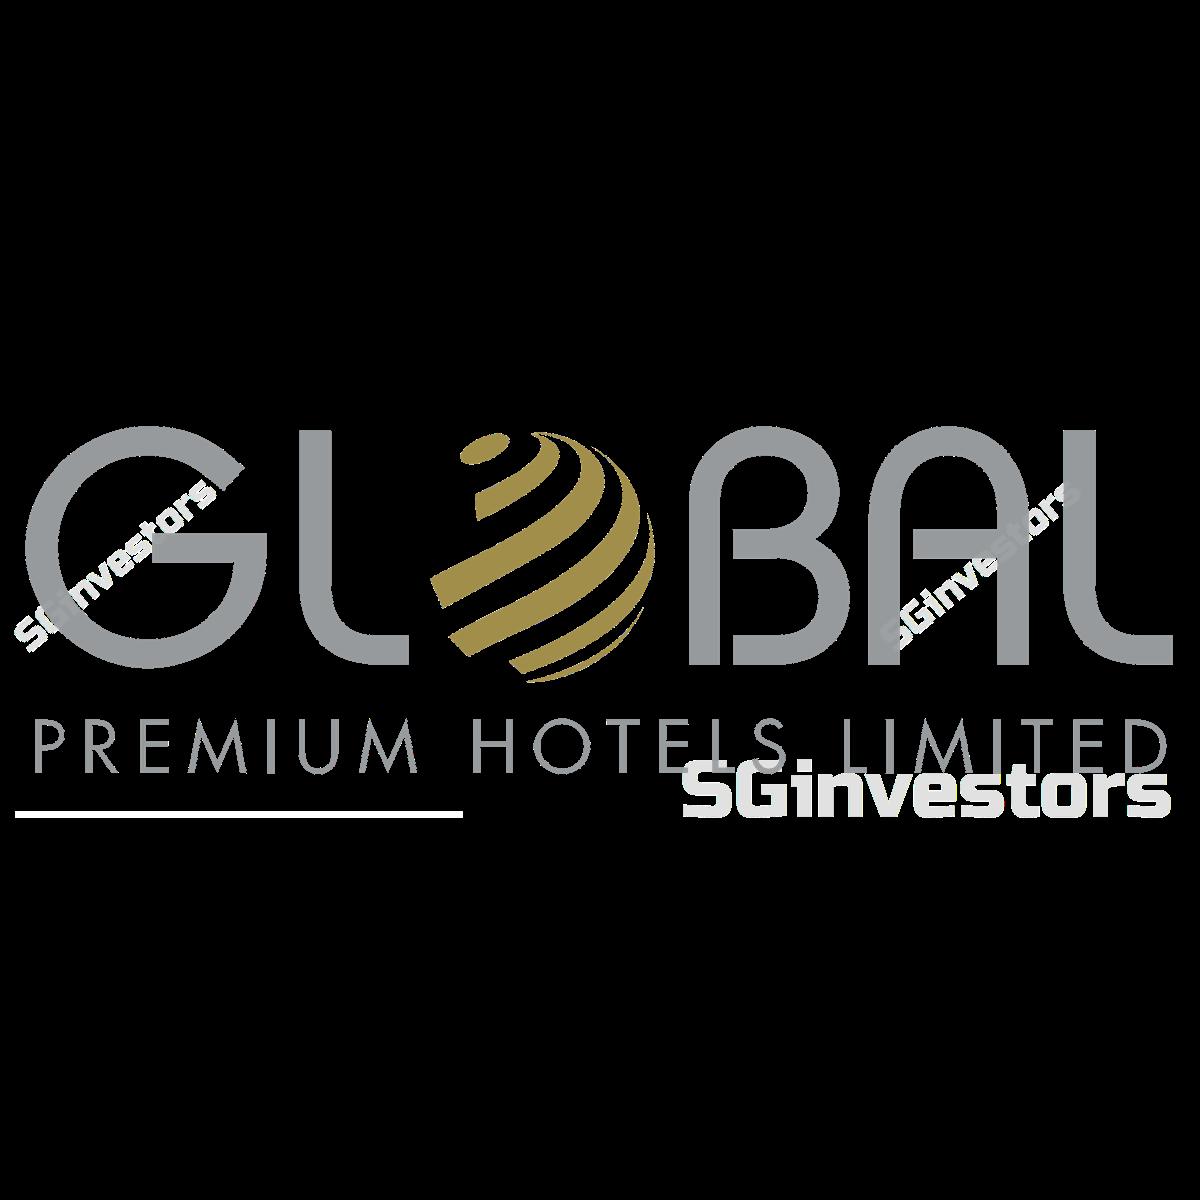 Global Premium Hotels - OCBC Investment 2017-02-14: Raising fair value to 34 S cents